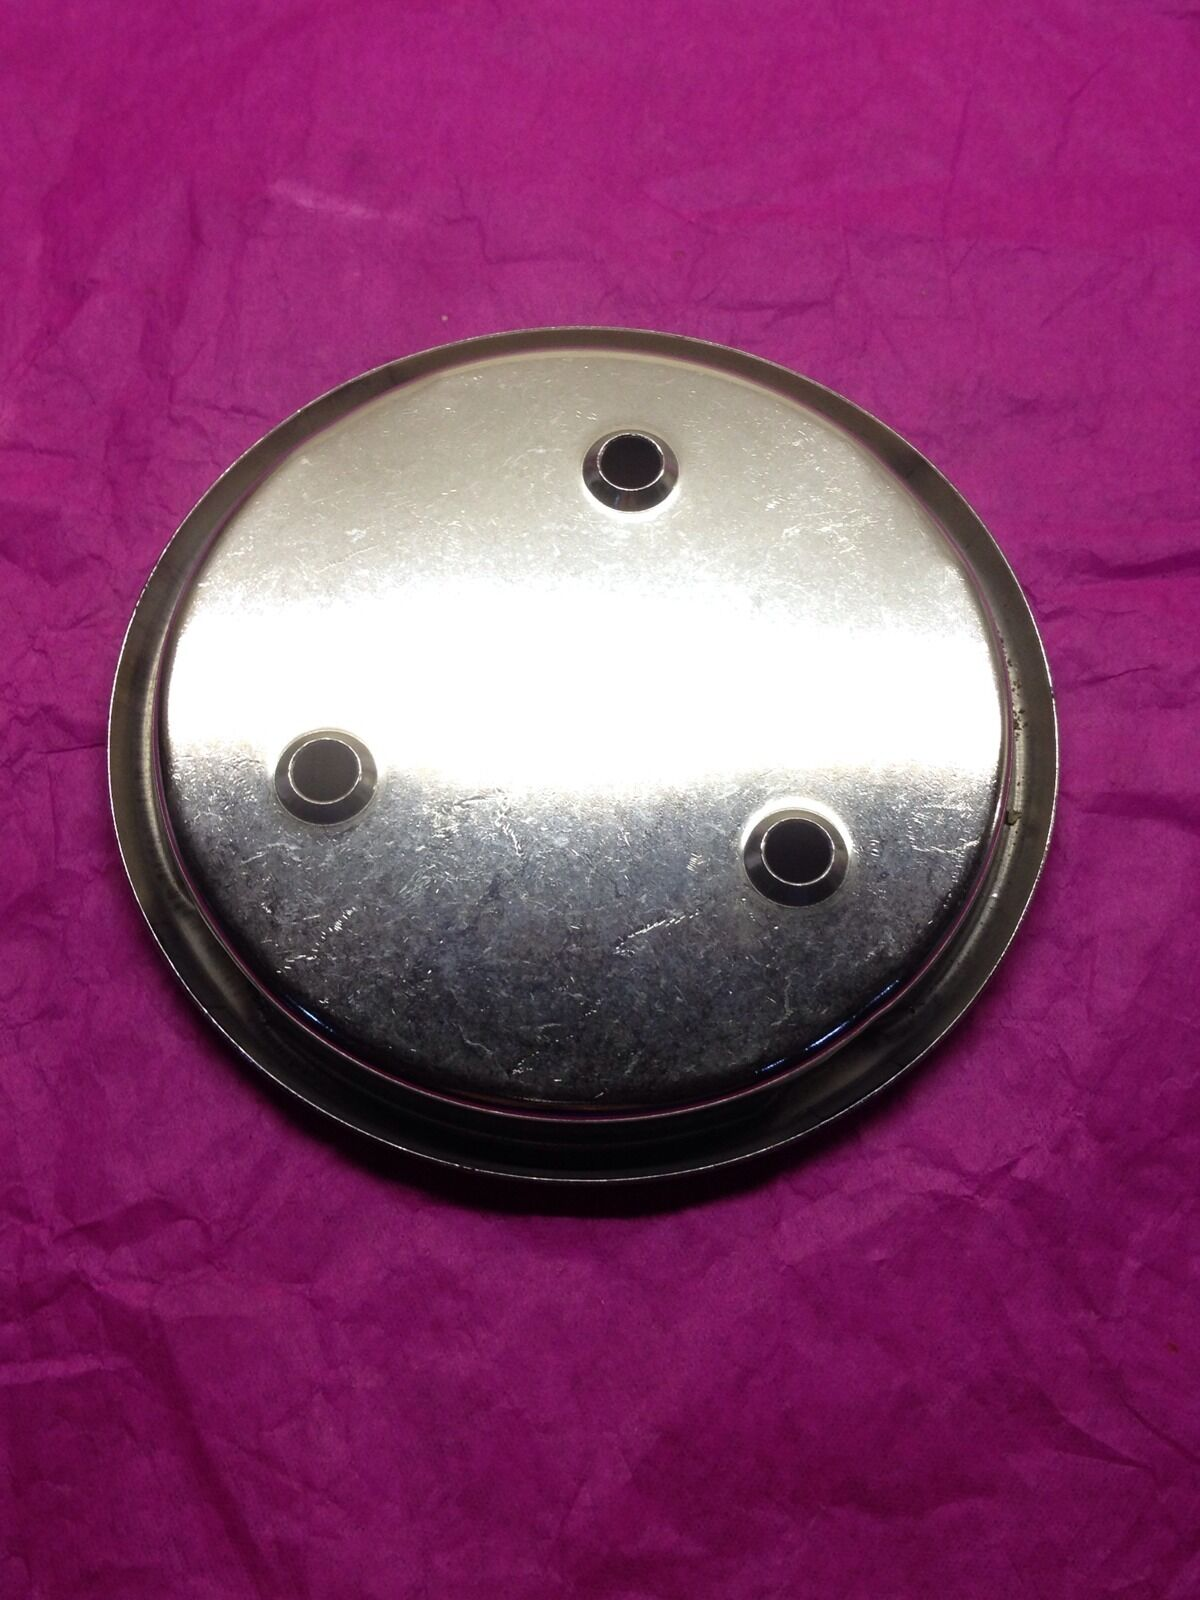 W10191926 GENUINE SPARE KITCHENAID STAND MIXER TWIST BOWL PLATE CAP 4163032